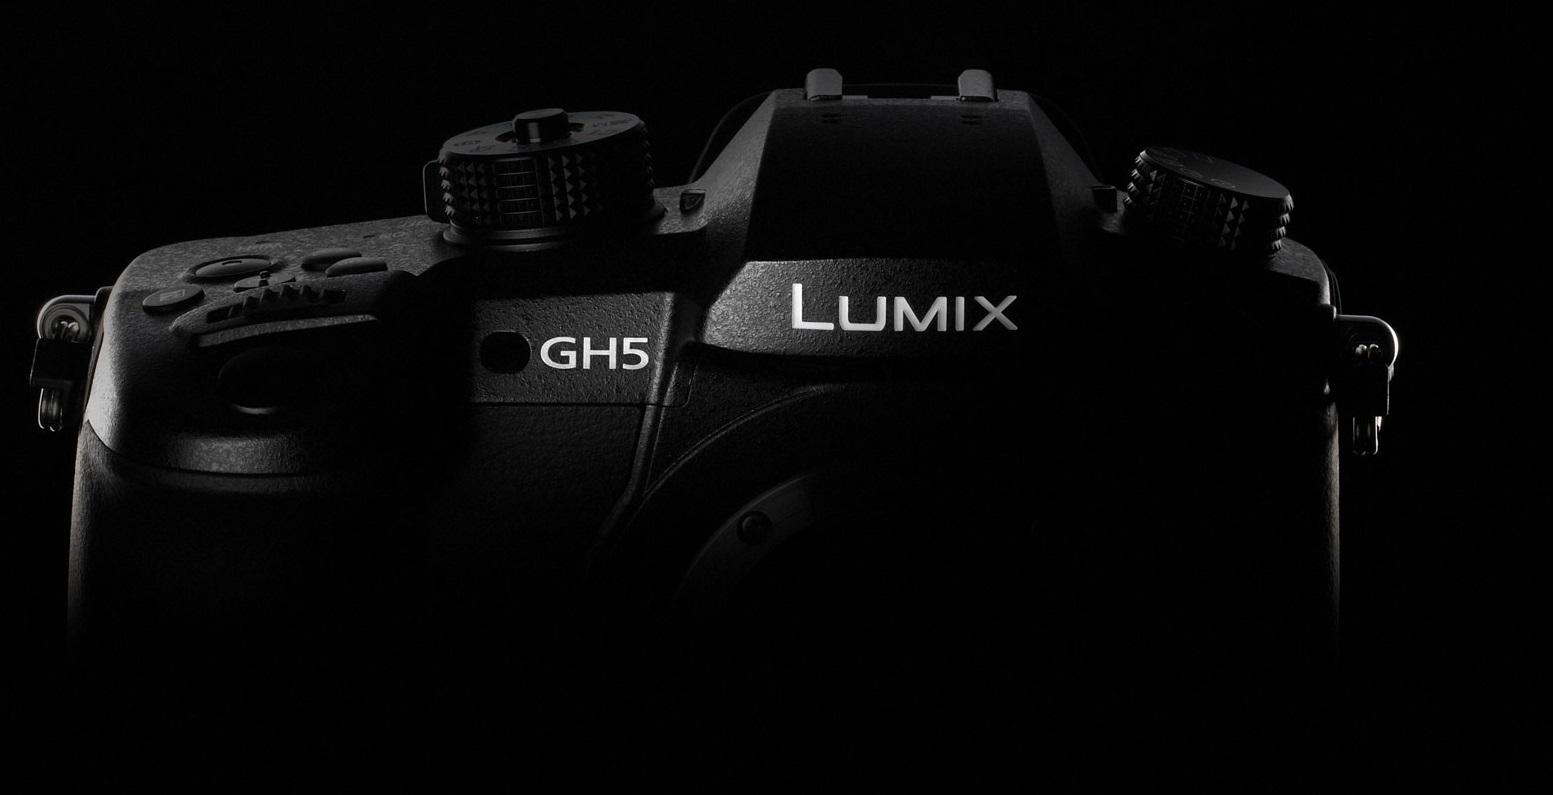 Panasonic anuncia sus Lumix GH5 (6K), FZ2500, G85 y LX 10